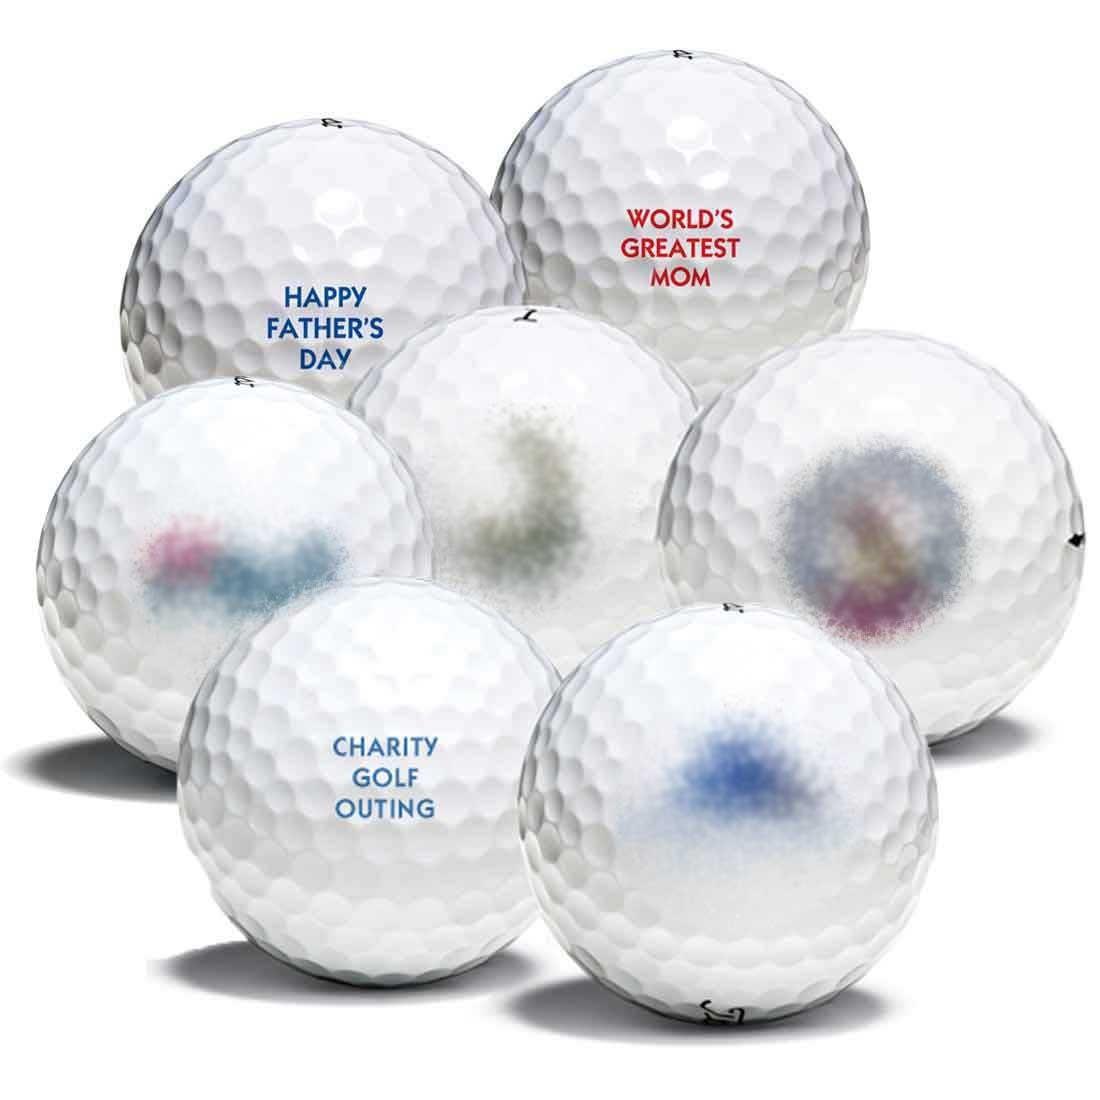 Titleist Prior Generation Pro V1 Logo Overrun Bagged Golf Balls 4.70 40 2 5  Titleist Prior Generation Pro V1 Logo Overrun Bagged Golf Balls (4.70),.